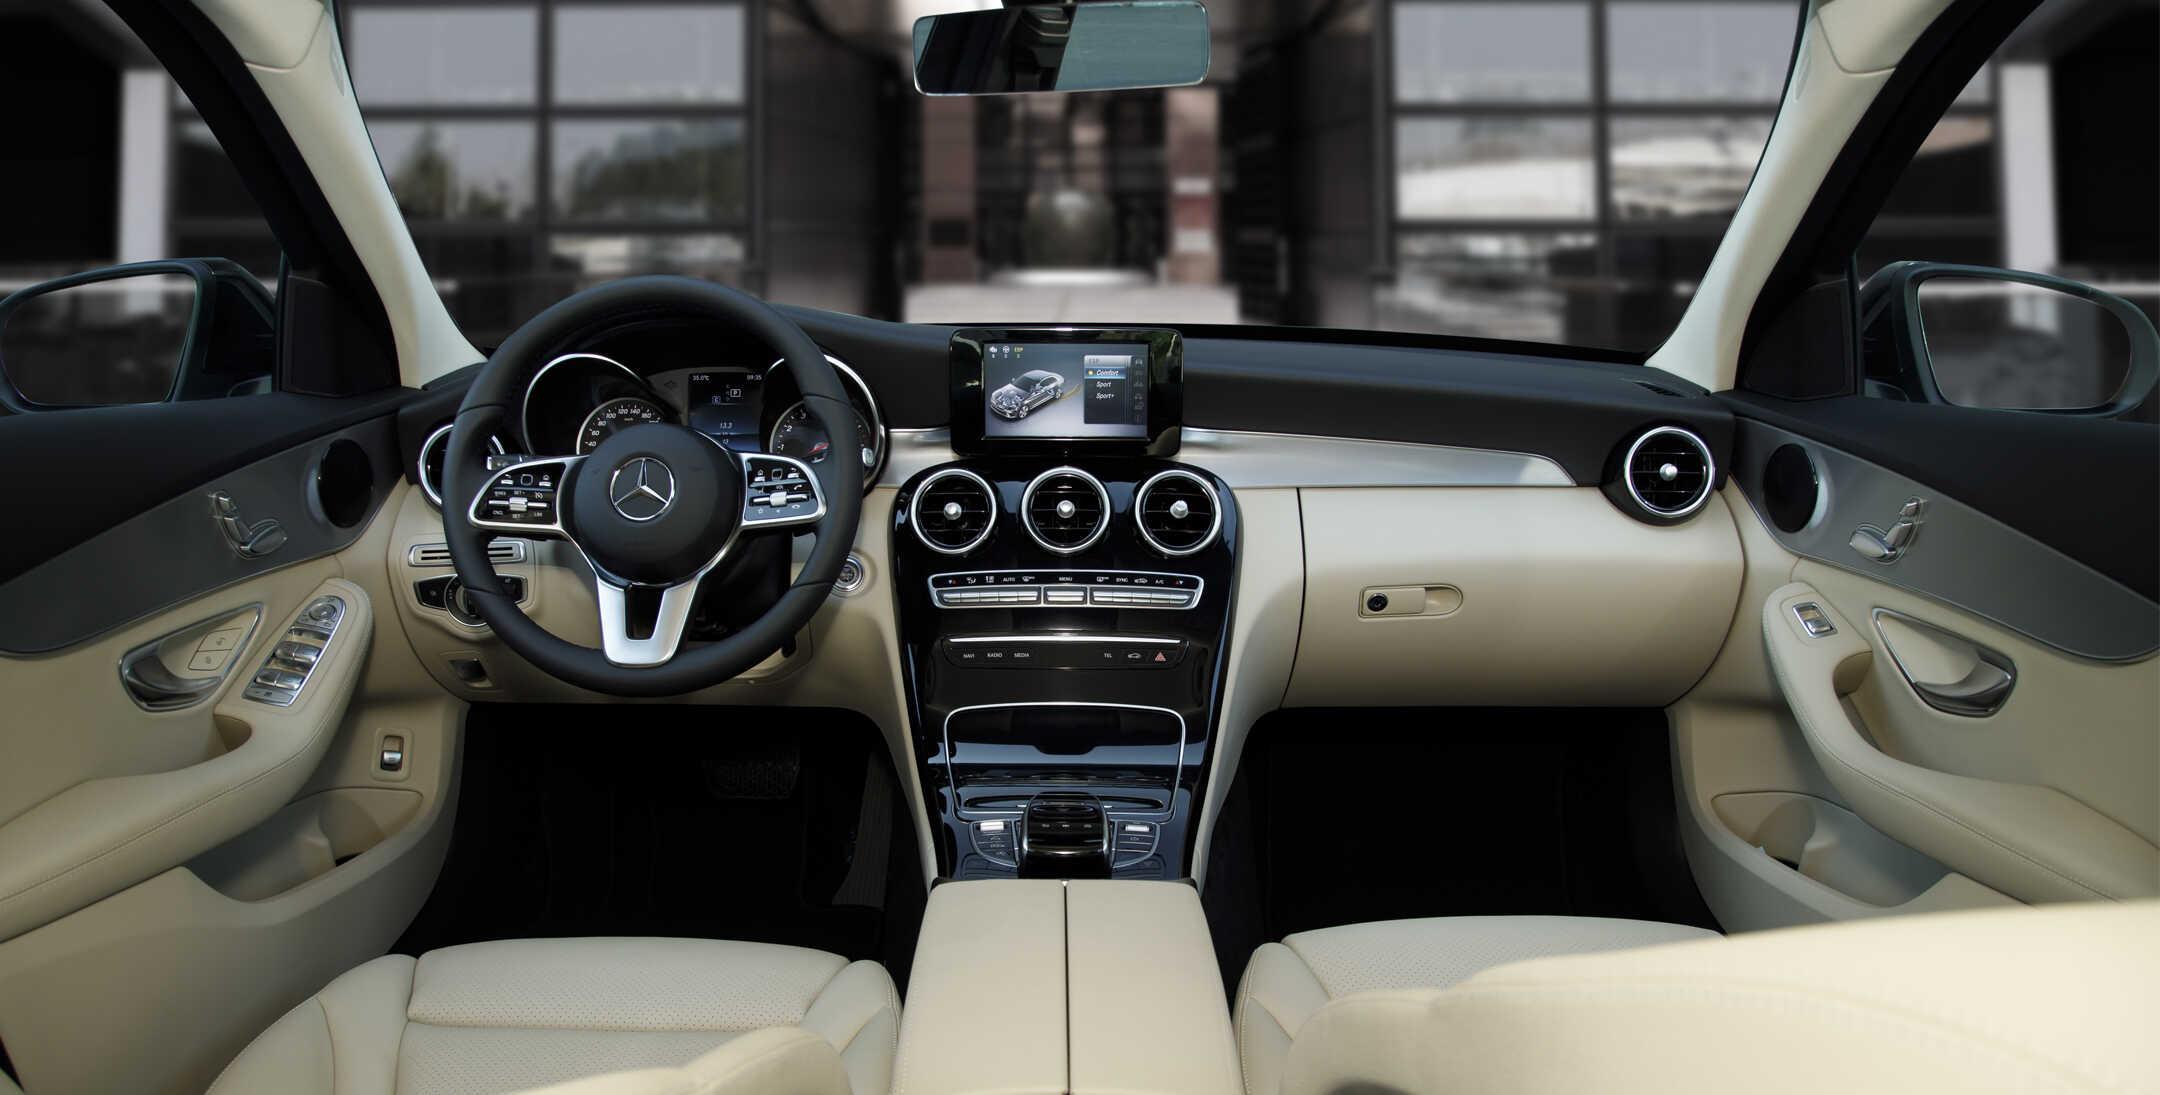 Mercedes C180 2022 mercedes vietnam (2)